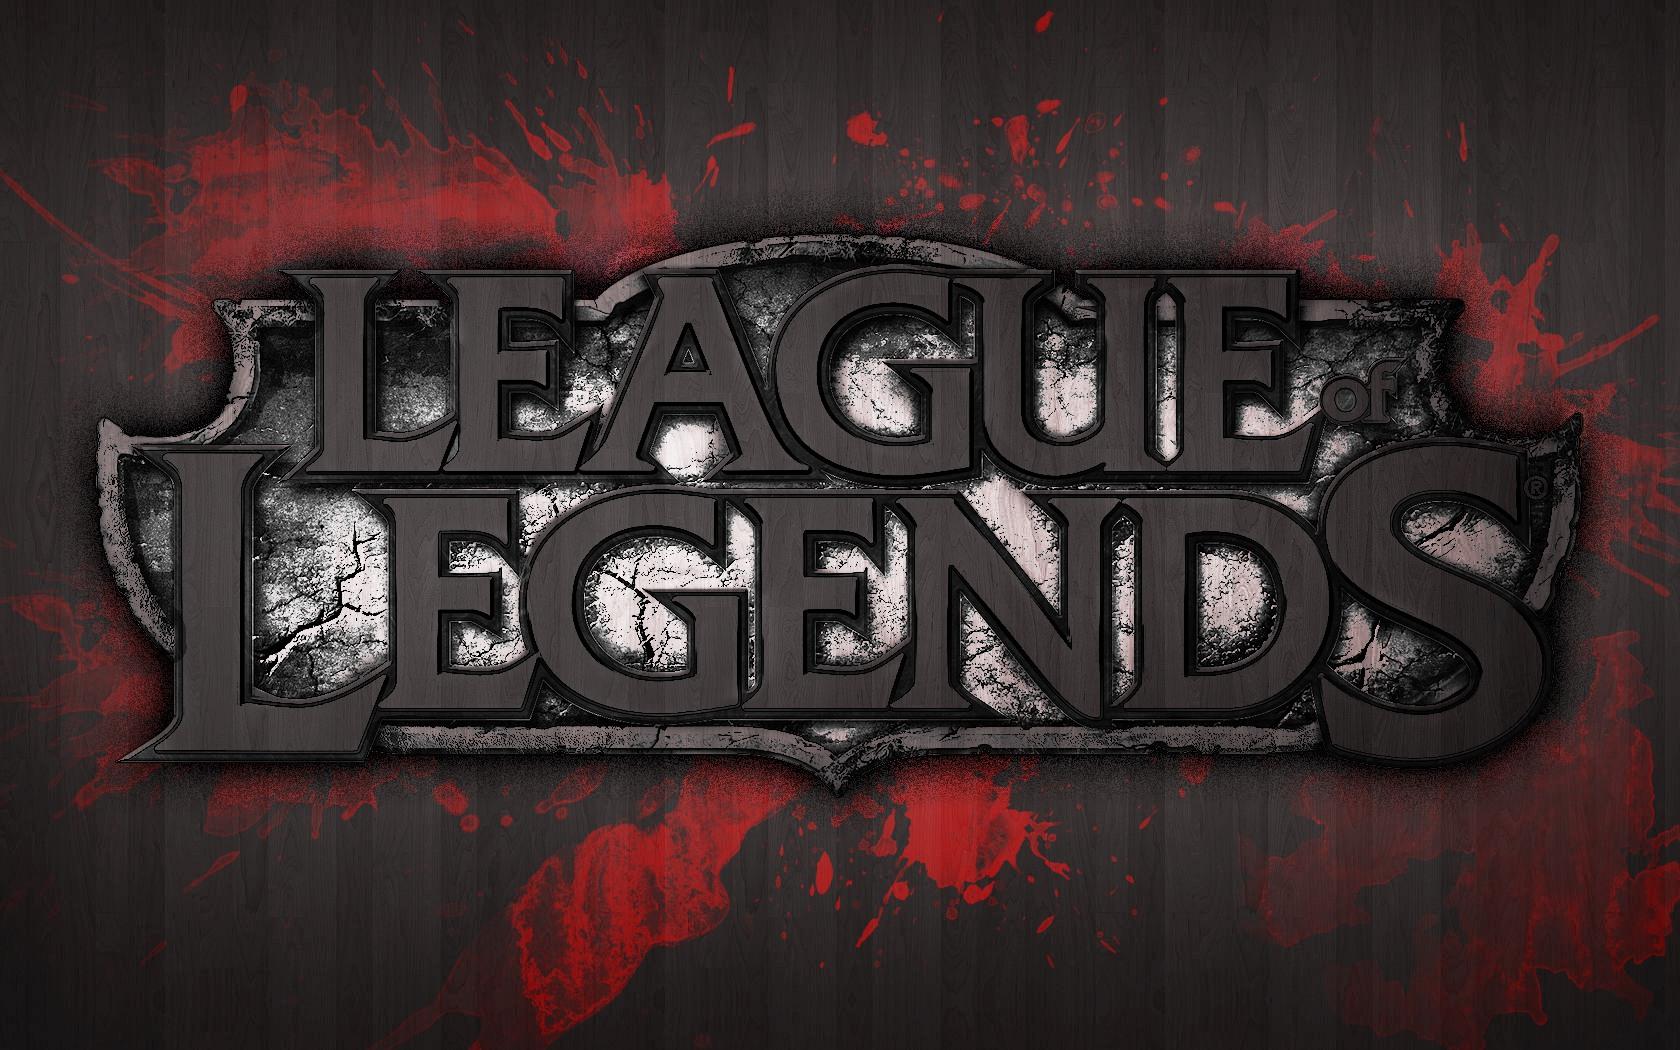 League of Legends desktop wallpaper